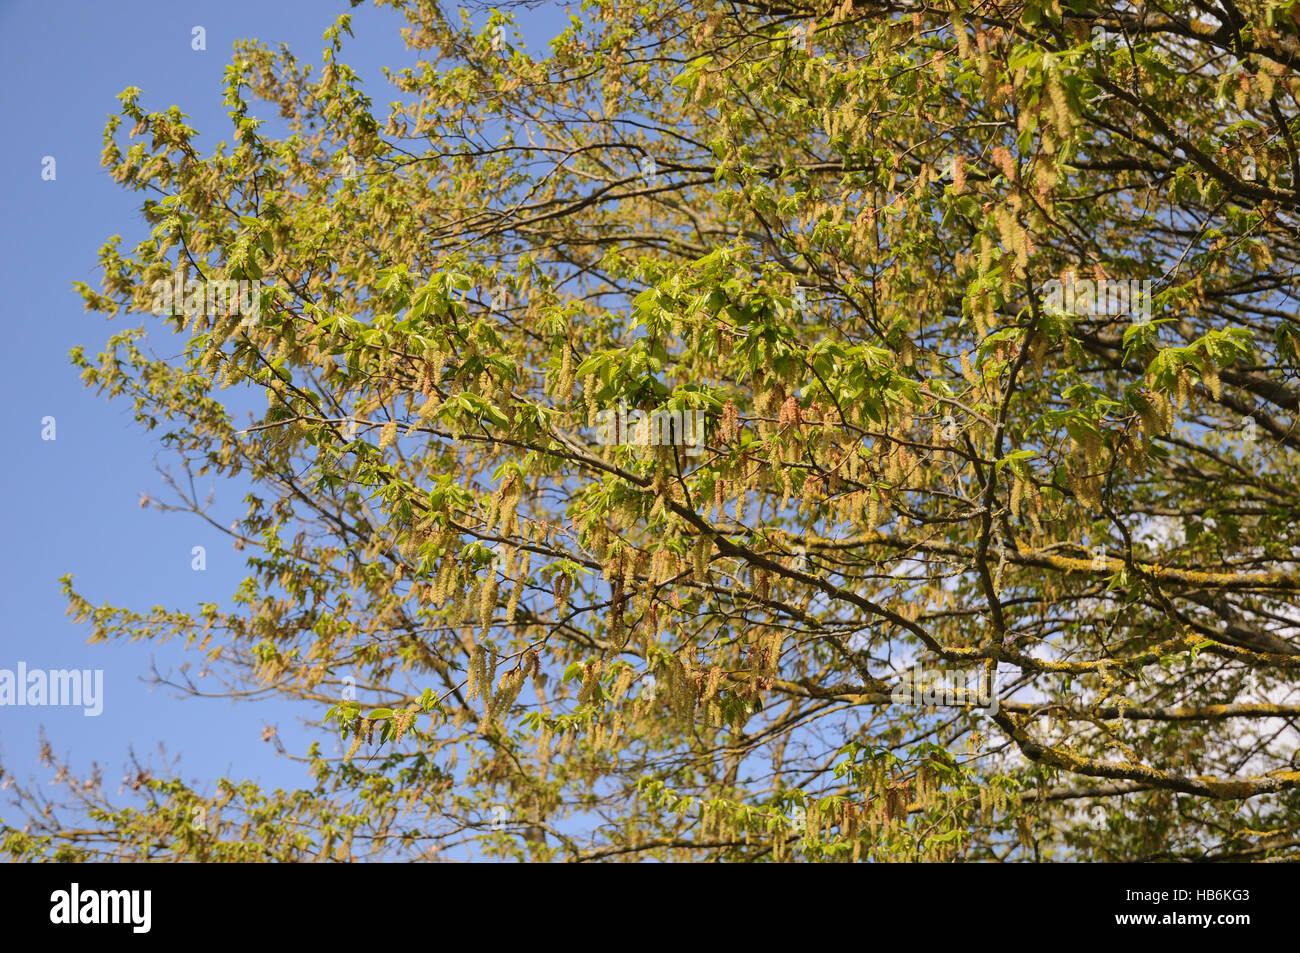 Carpinus betulus, Hornbeam - Stock Image